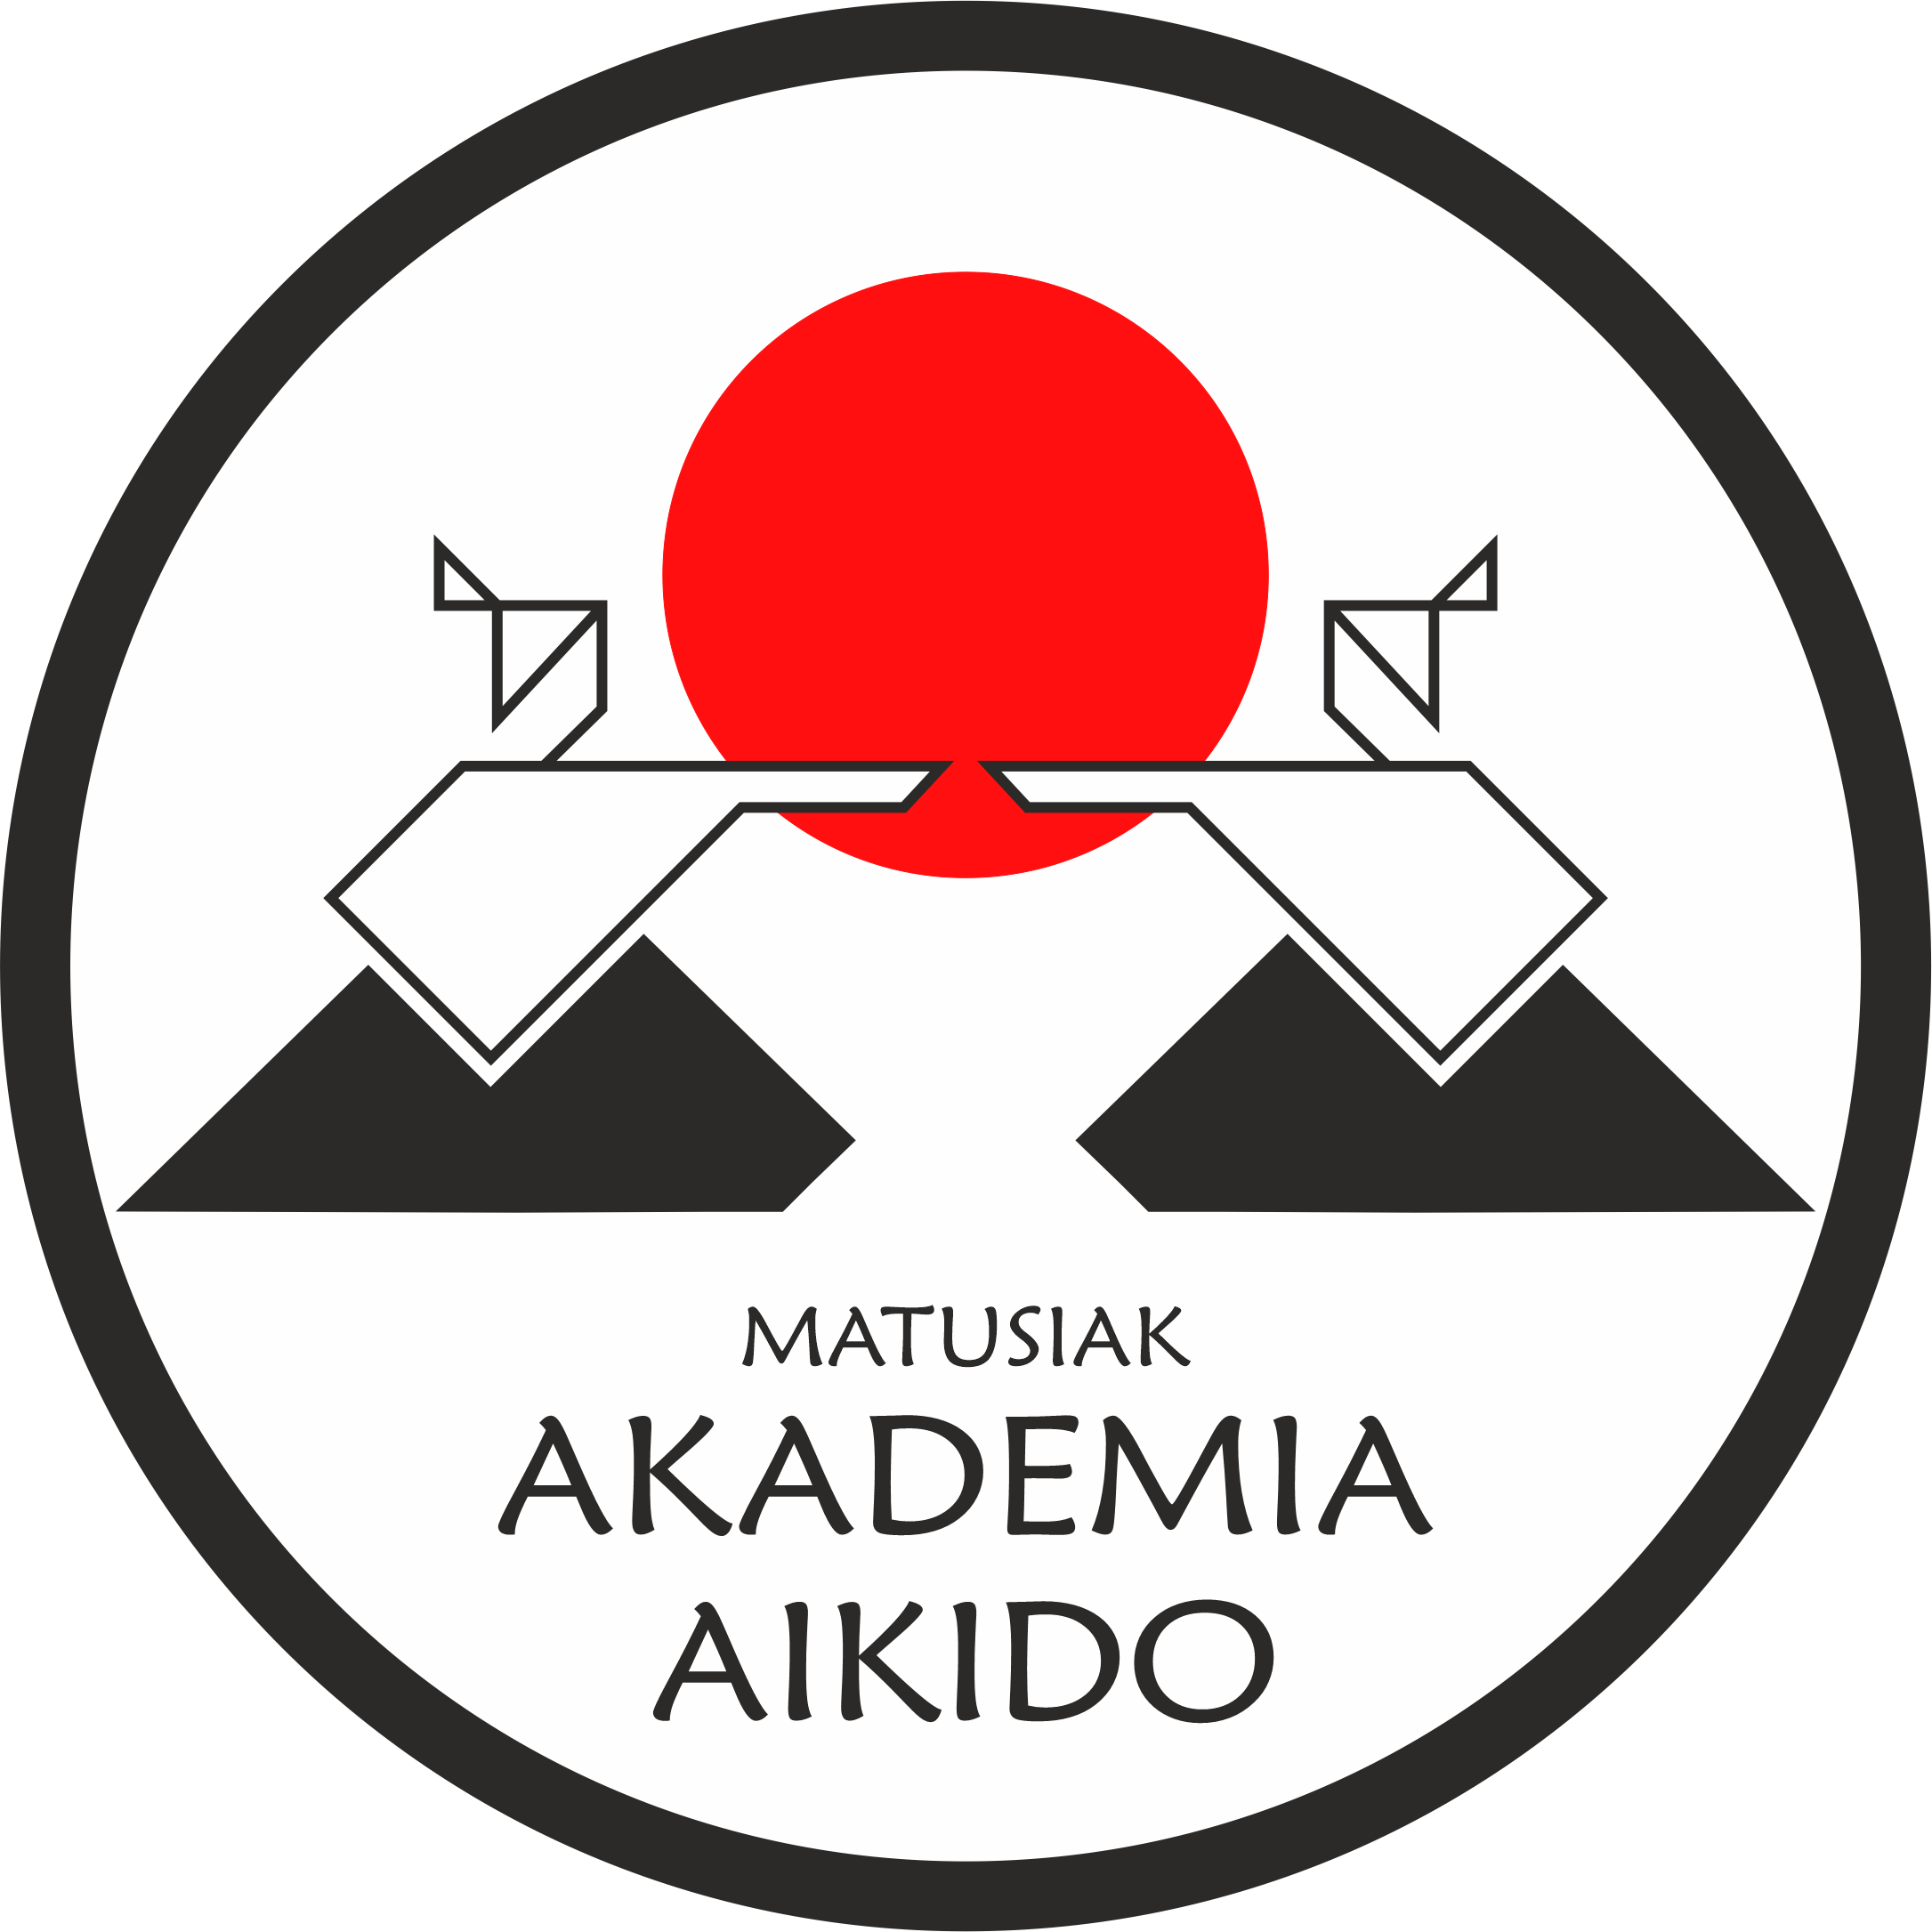 Matusiak Akademia Aikido